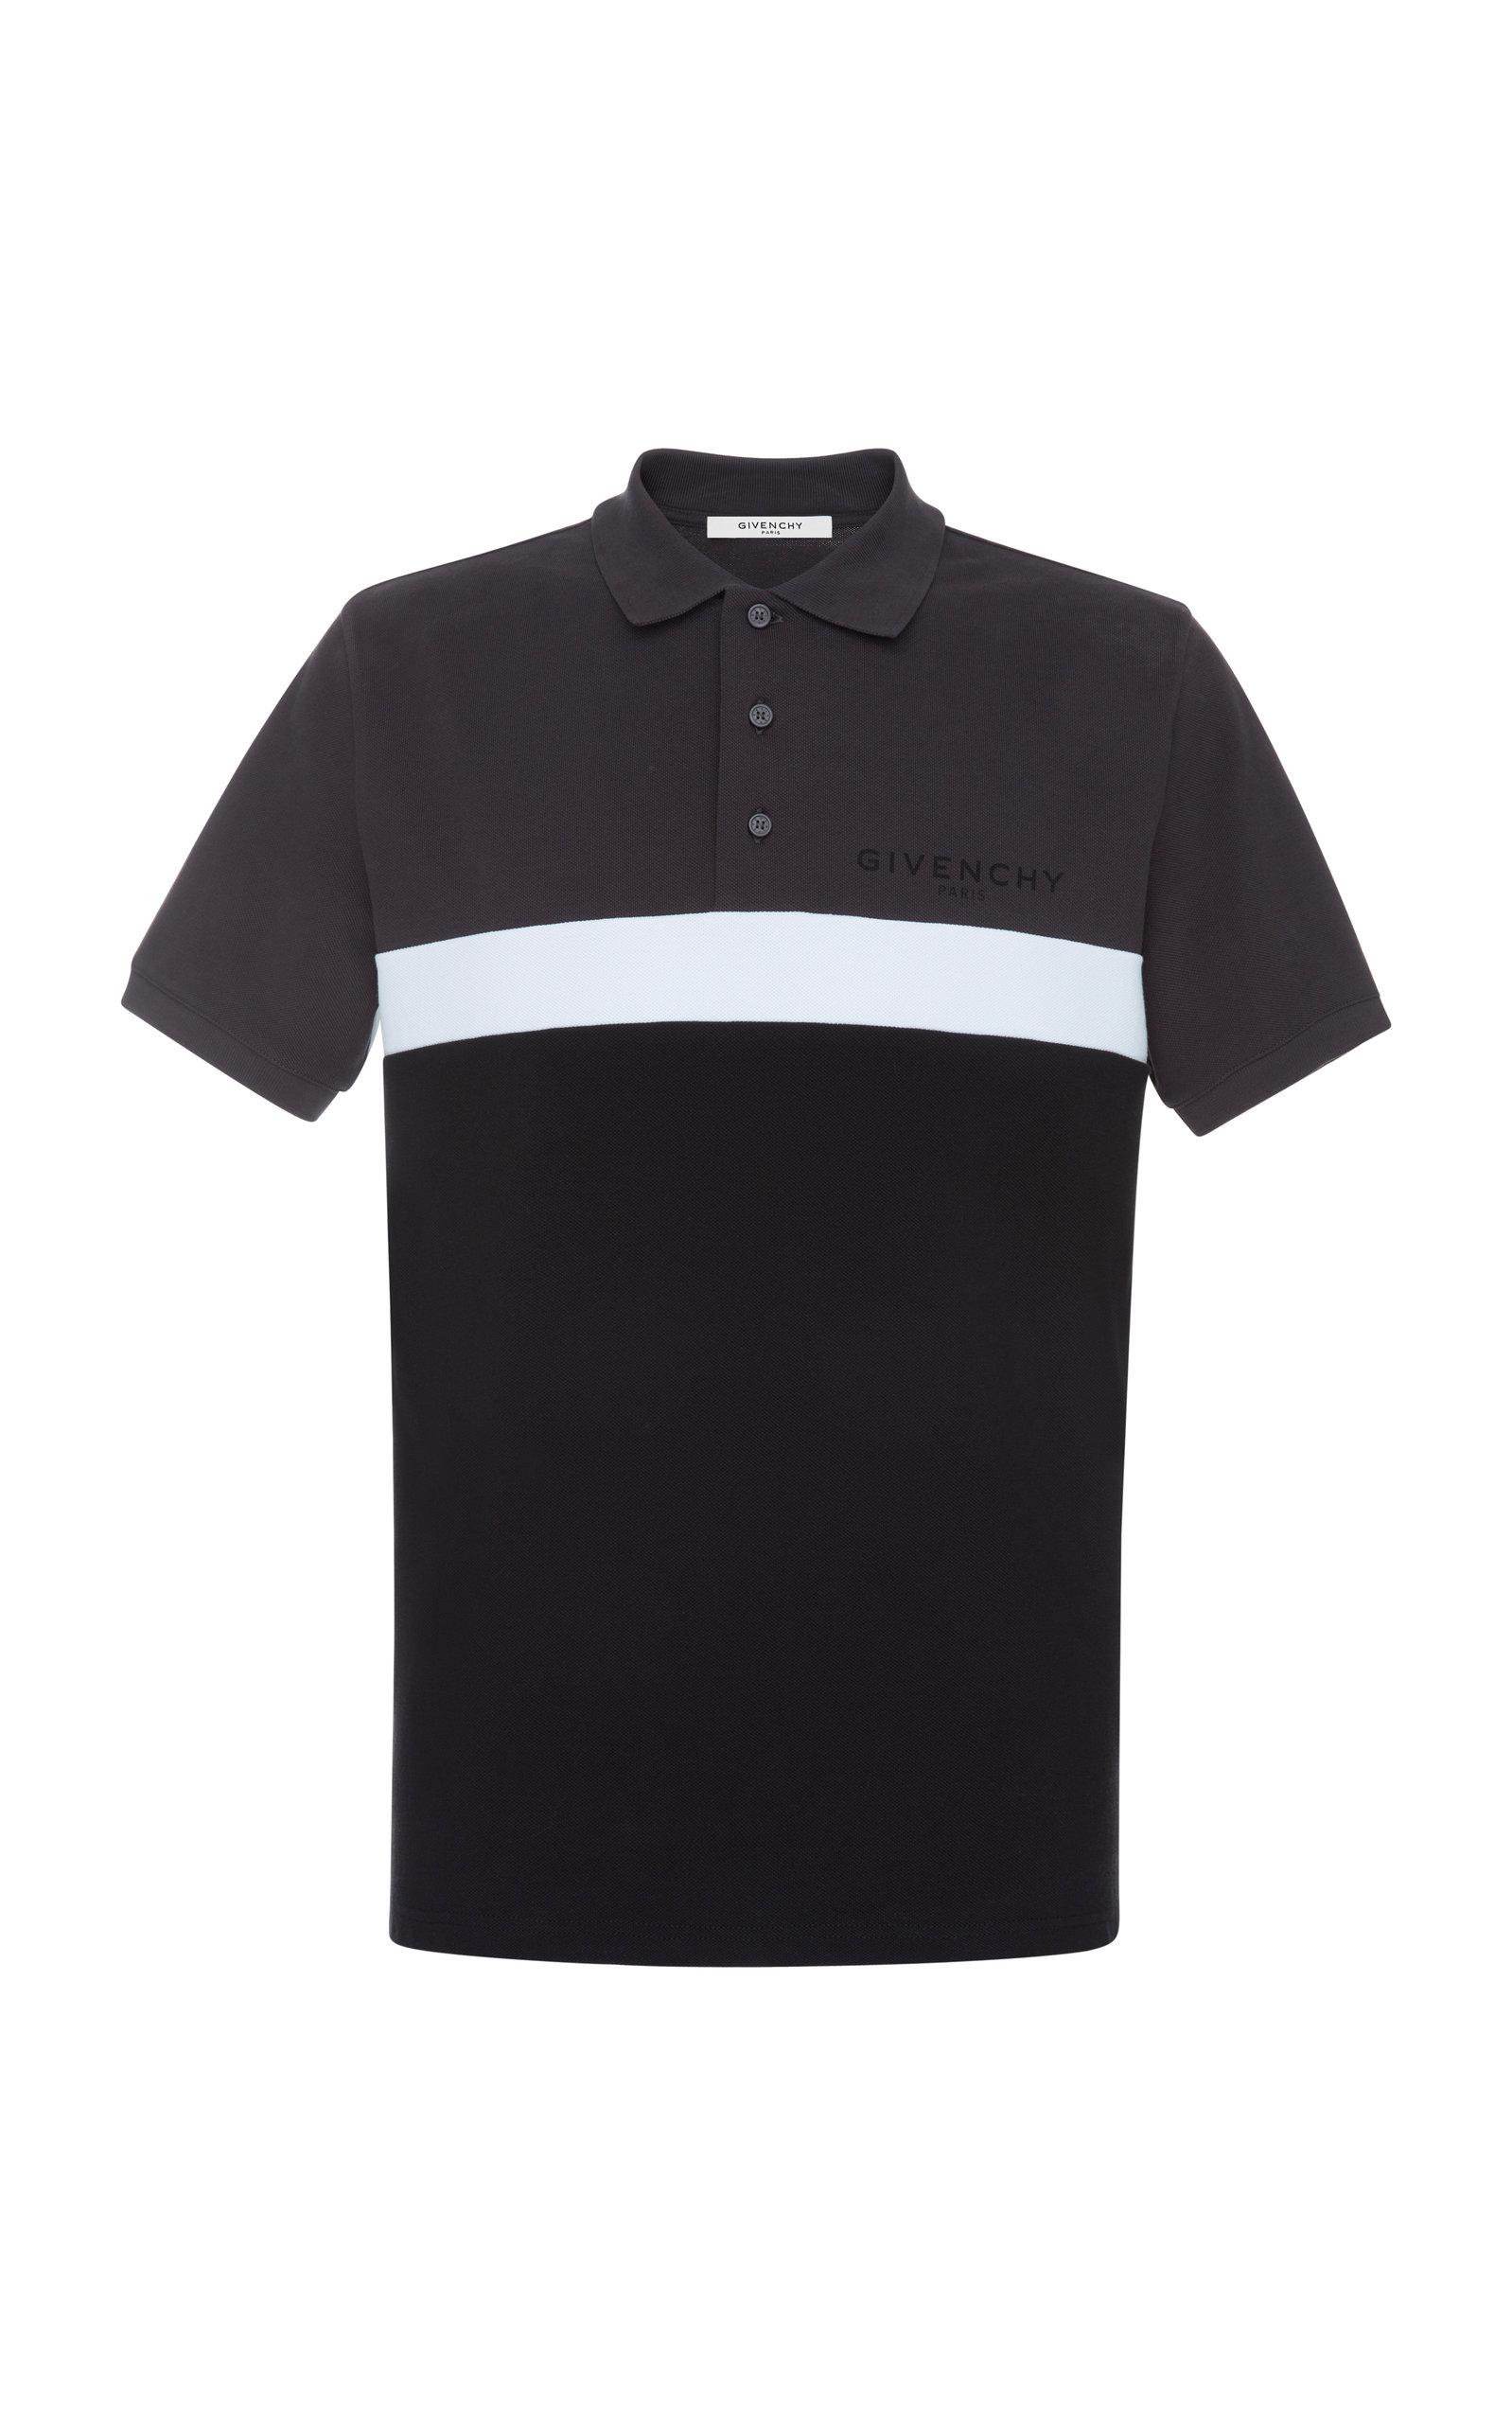 18fc4b7f Striped Printed Cotton-Piqué Polo Shirt by Givenchy   Moda Operandi